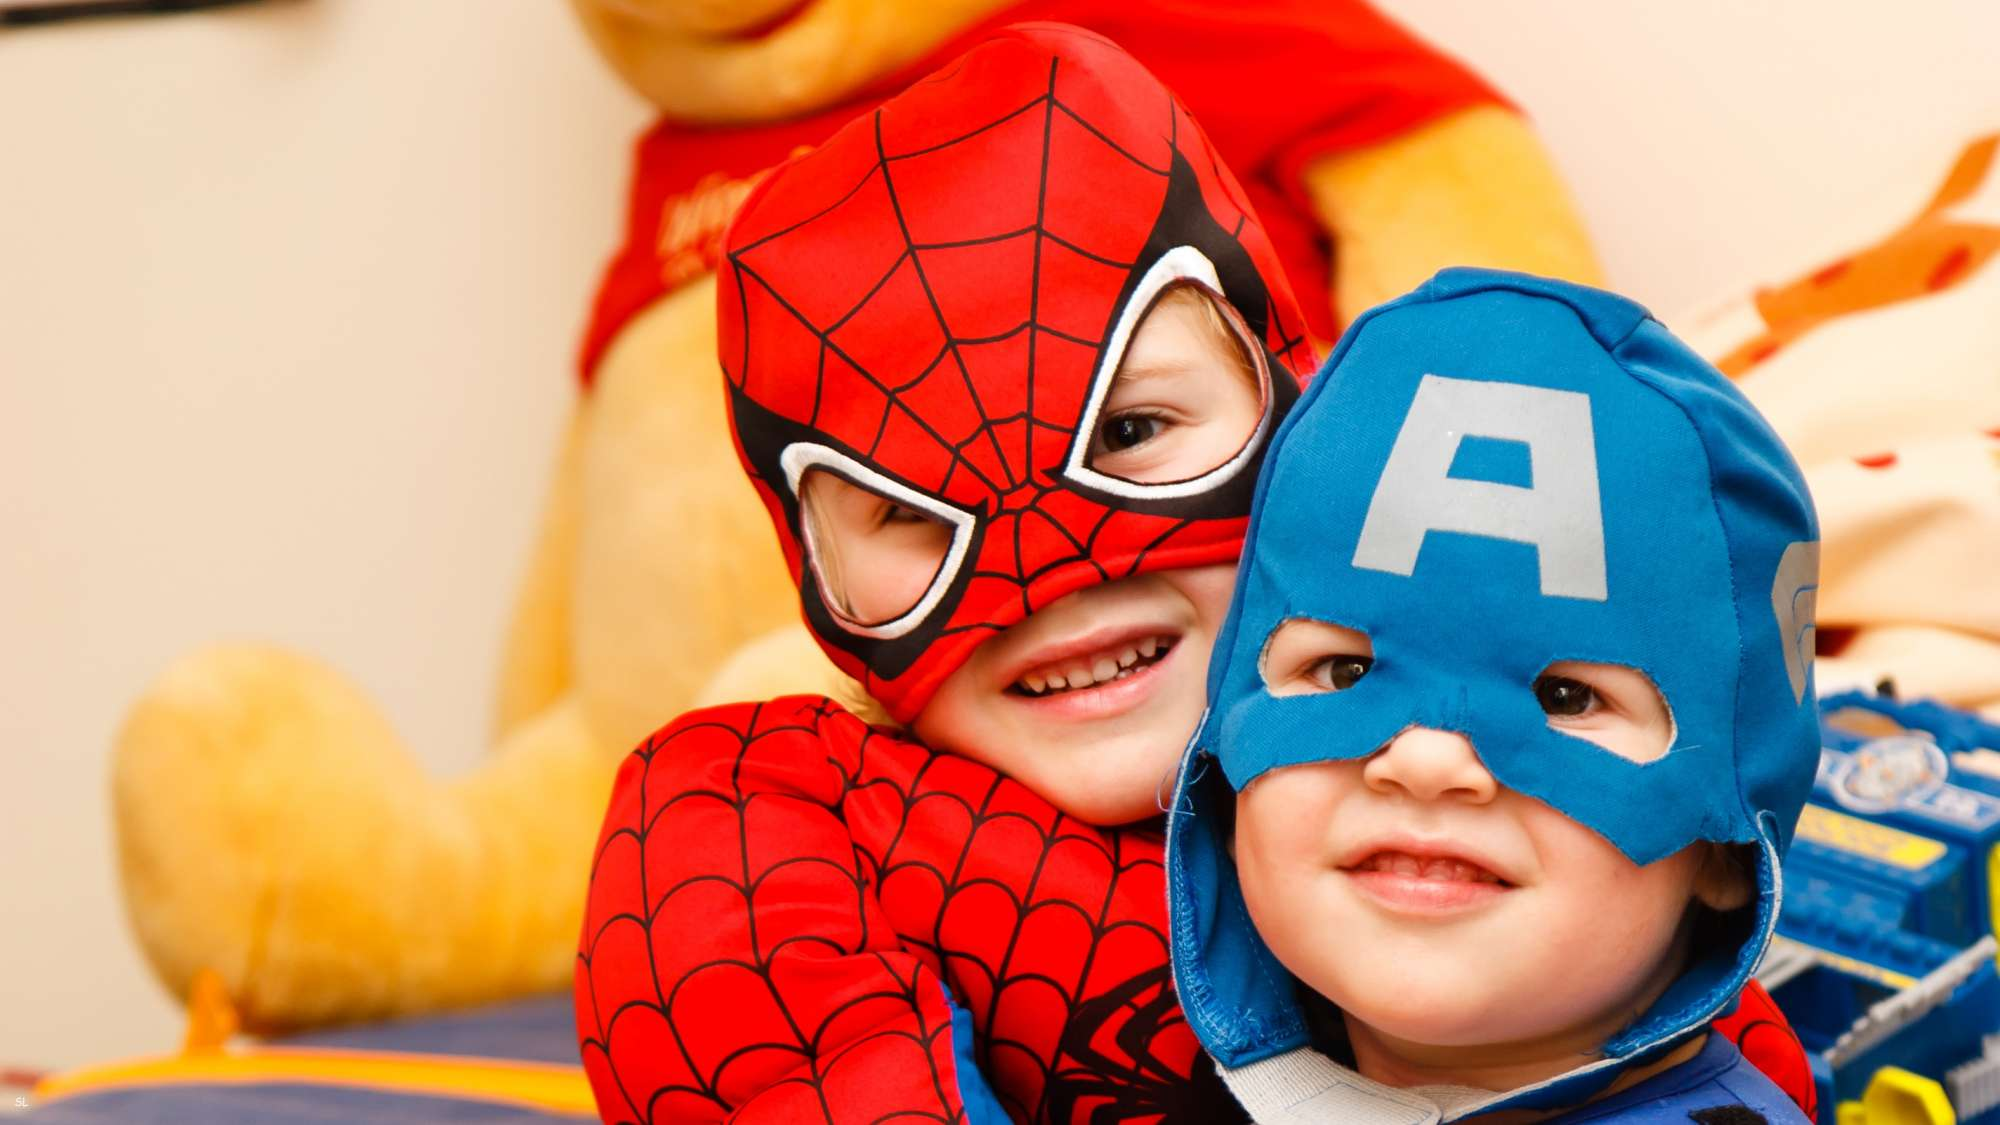 Two Children Dressed in superhero costume